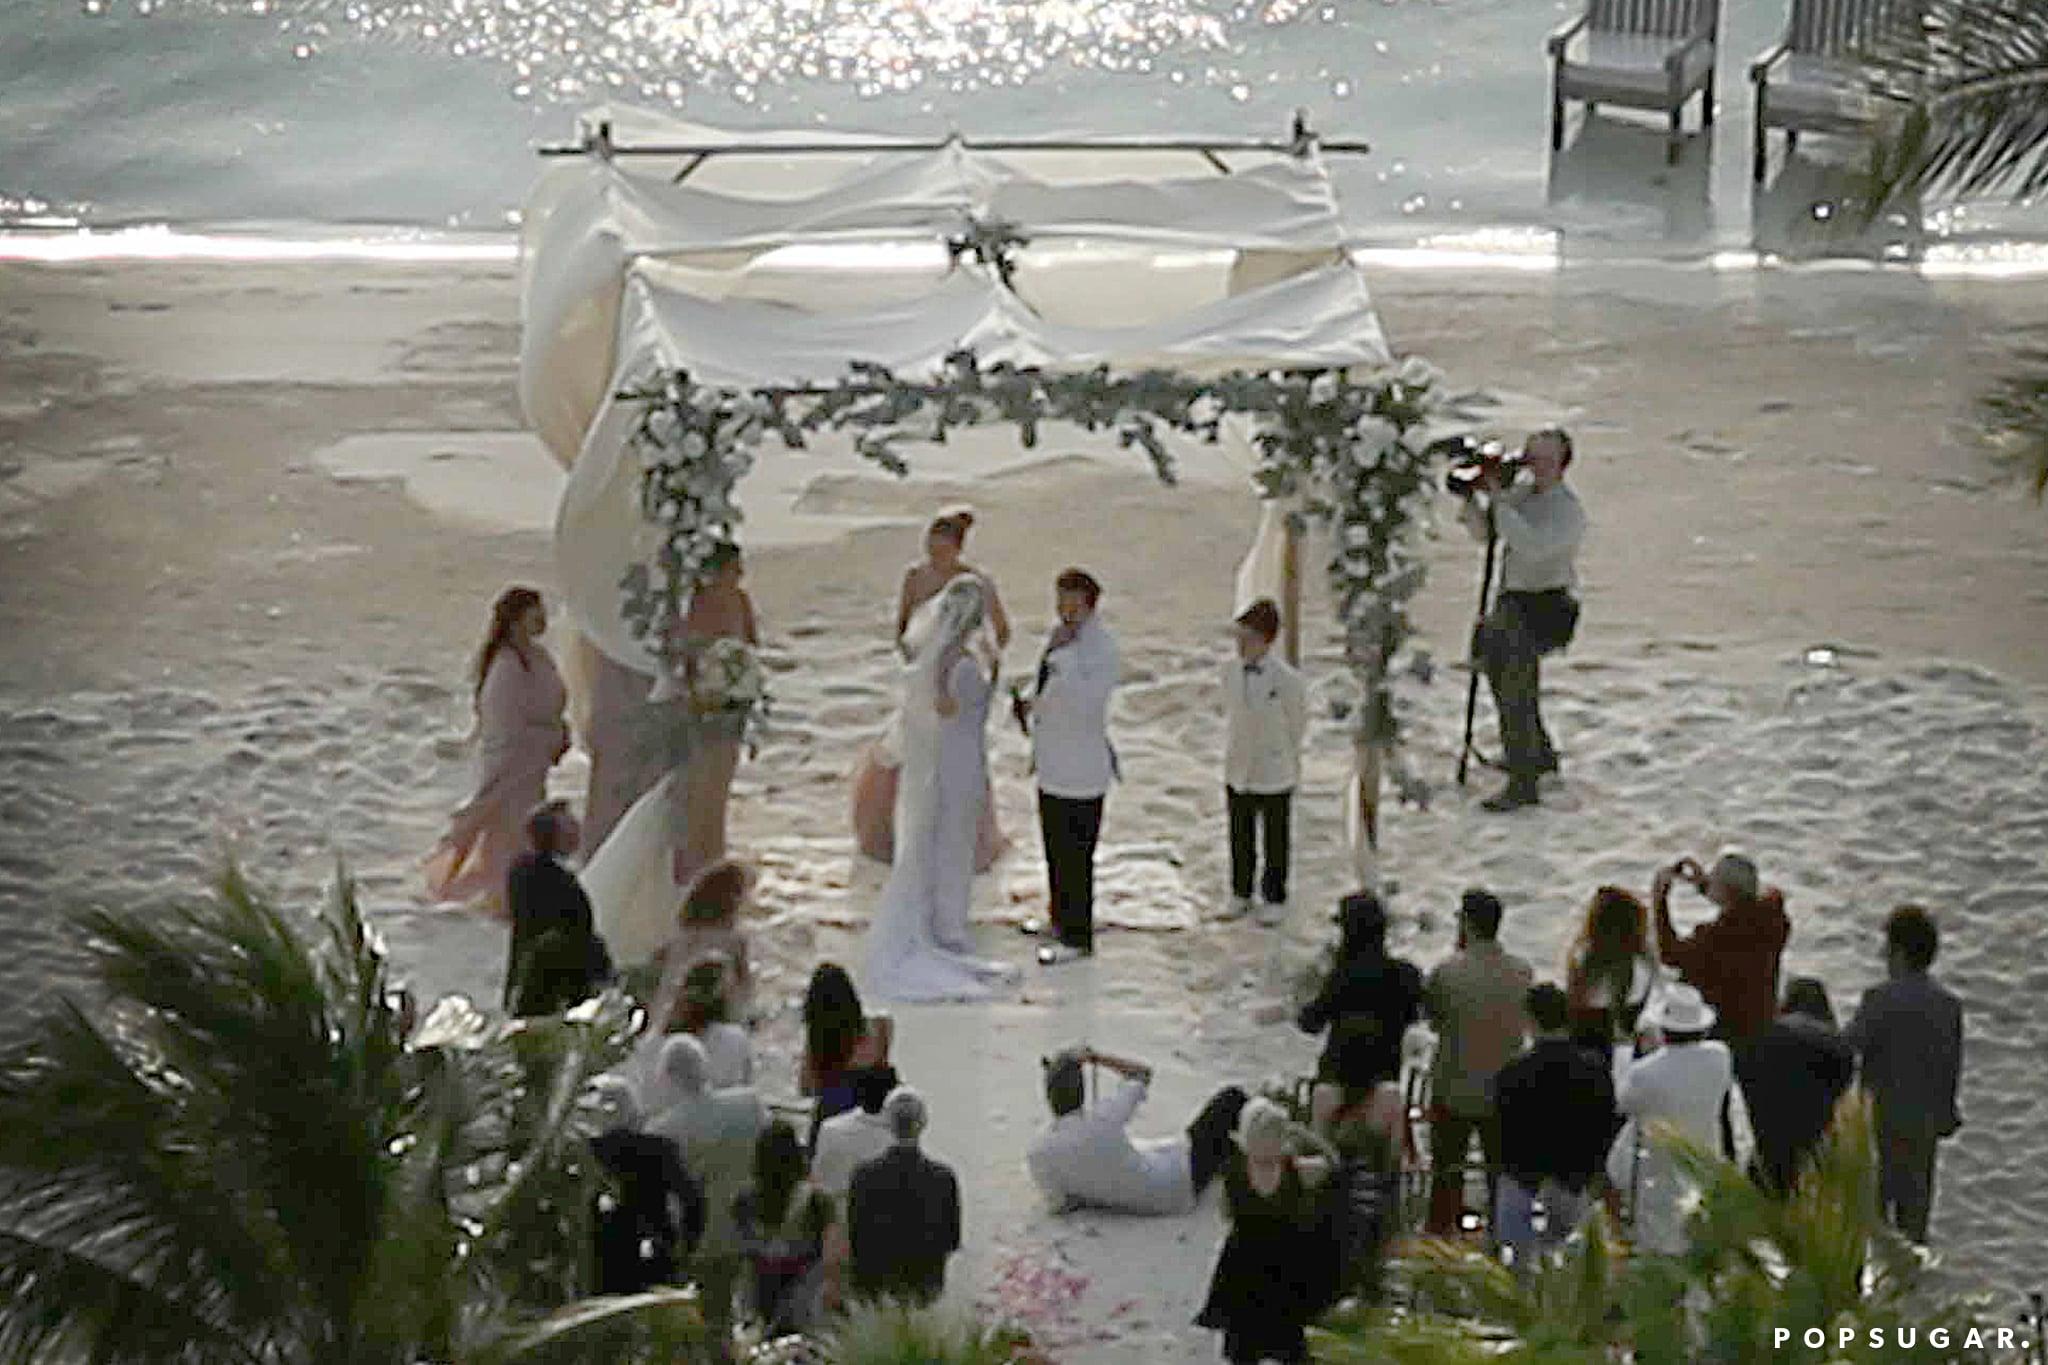 Johnny Depp and Amber Heard Wedding Pictures   POPSUGAR Celebrity